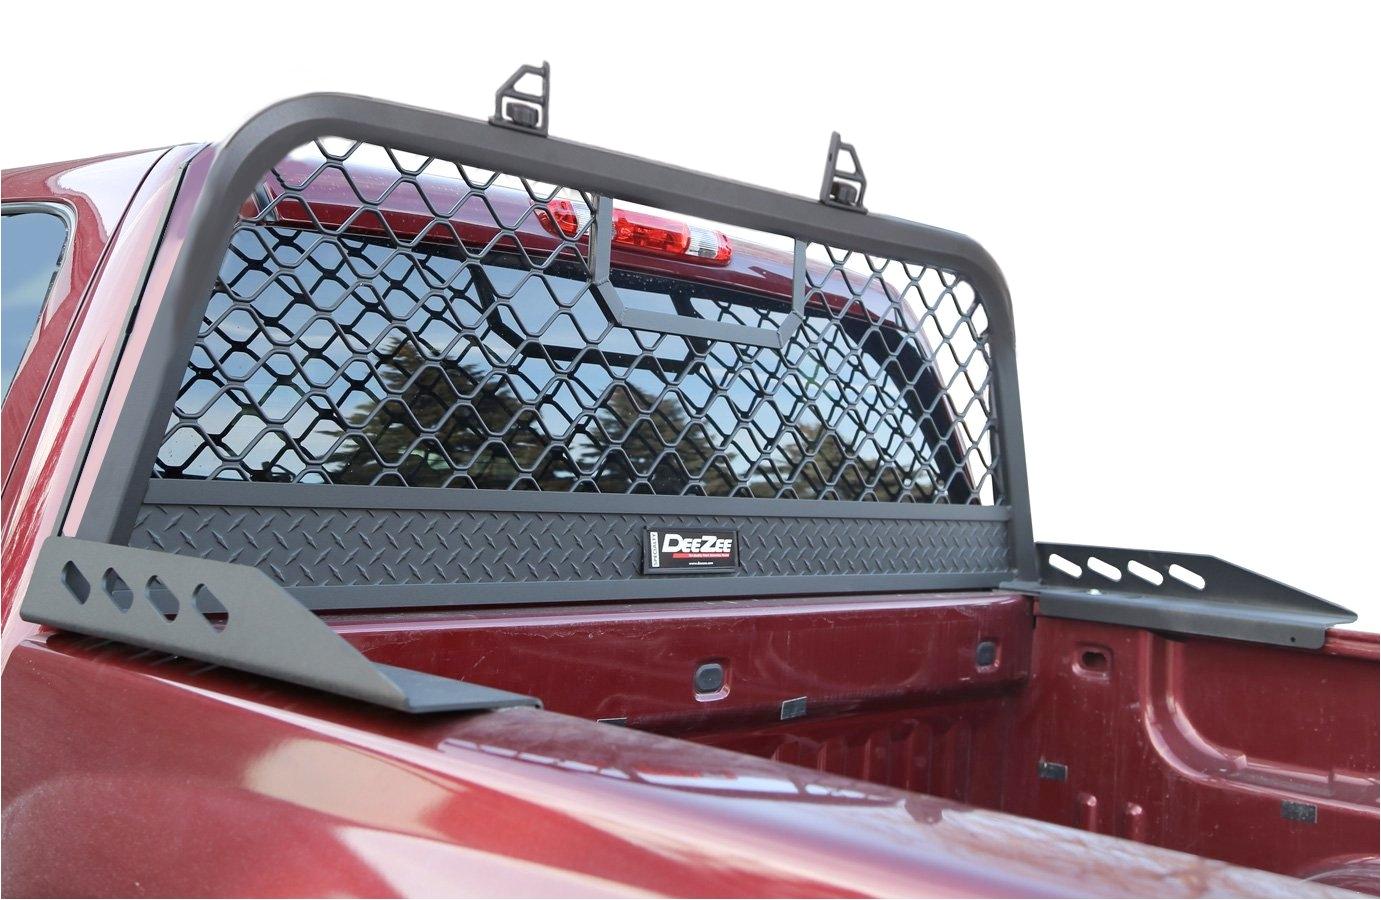 Dee Zee Headache Rack Ram 2500 Dee Zee Headache Rack Steel Aluminium Mesh Truck Rack